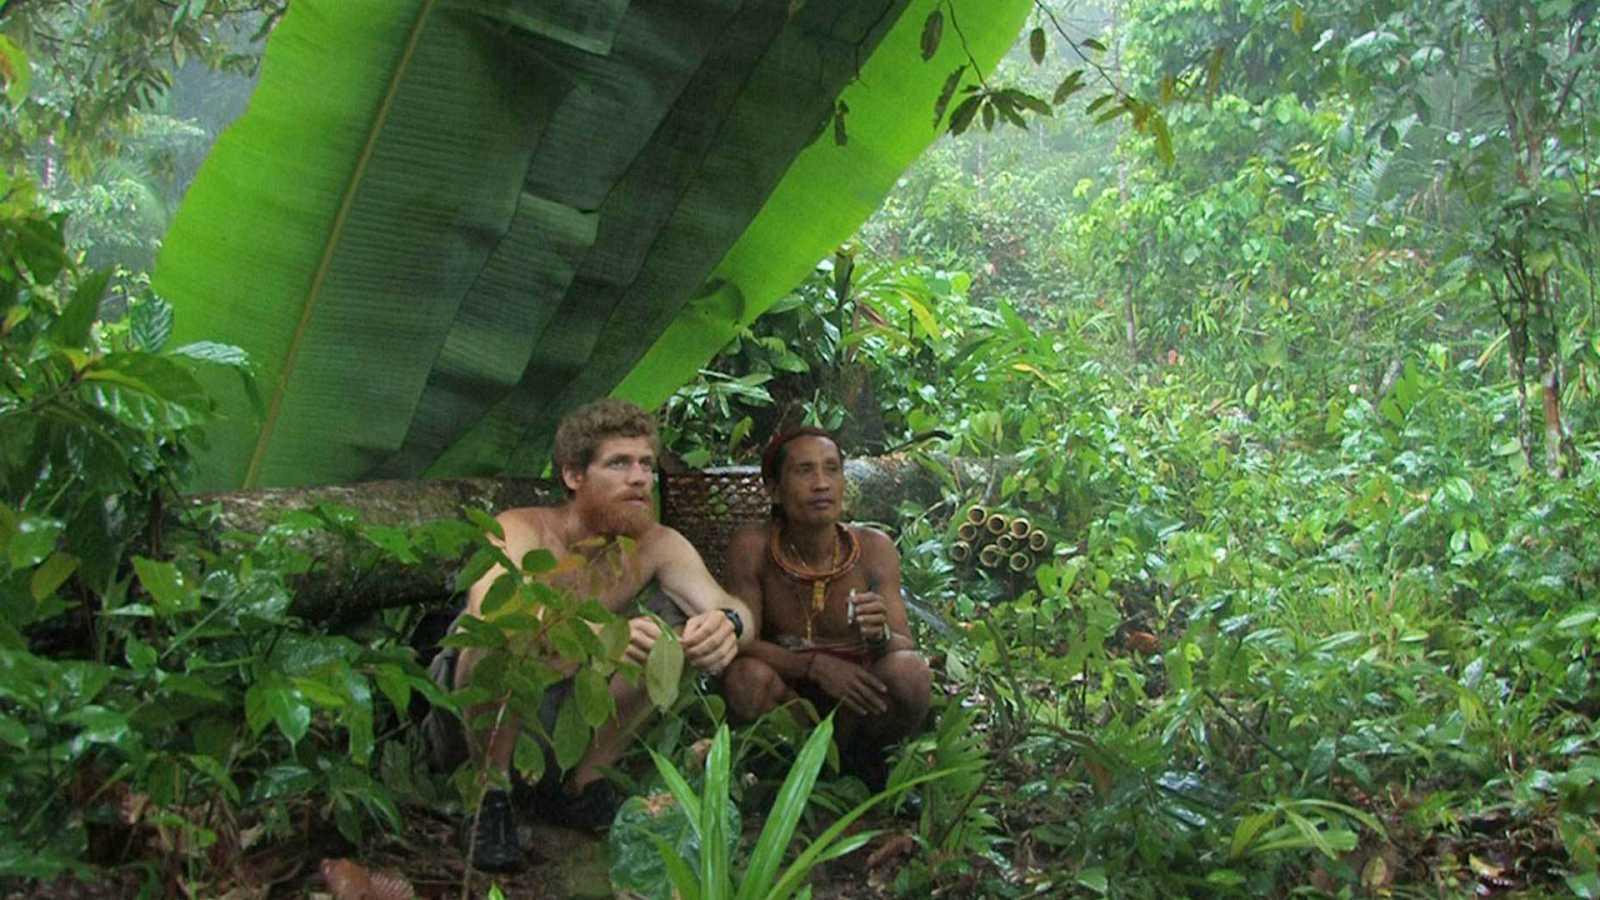 Reserva natural - Octubre, mes de festivales de cine ambiental - 15/10/20 - Escuchar ahora